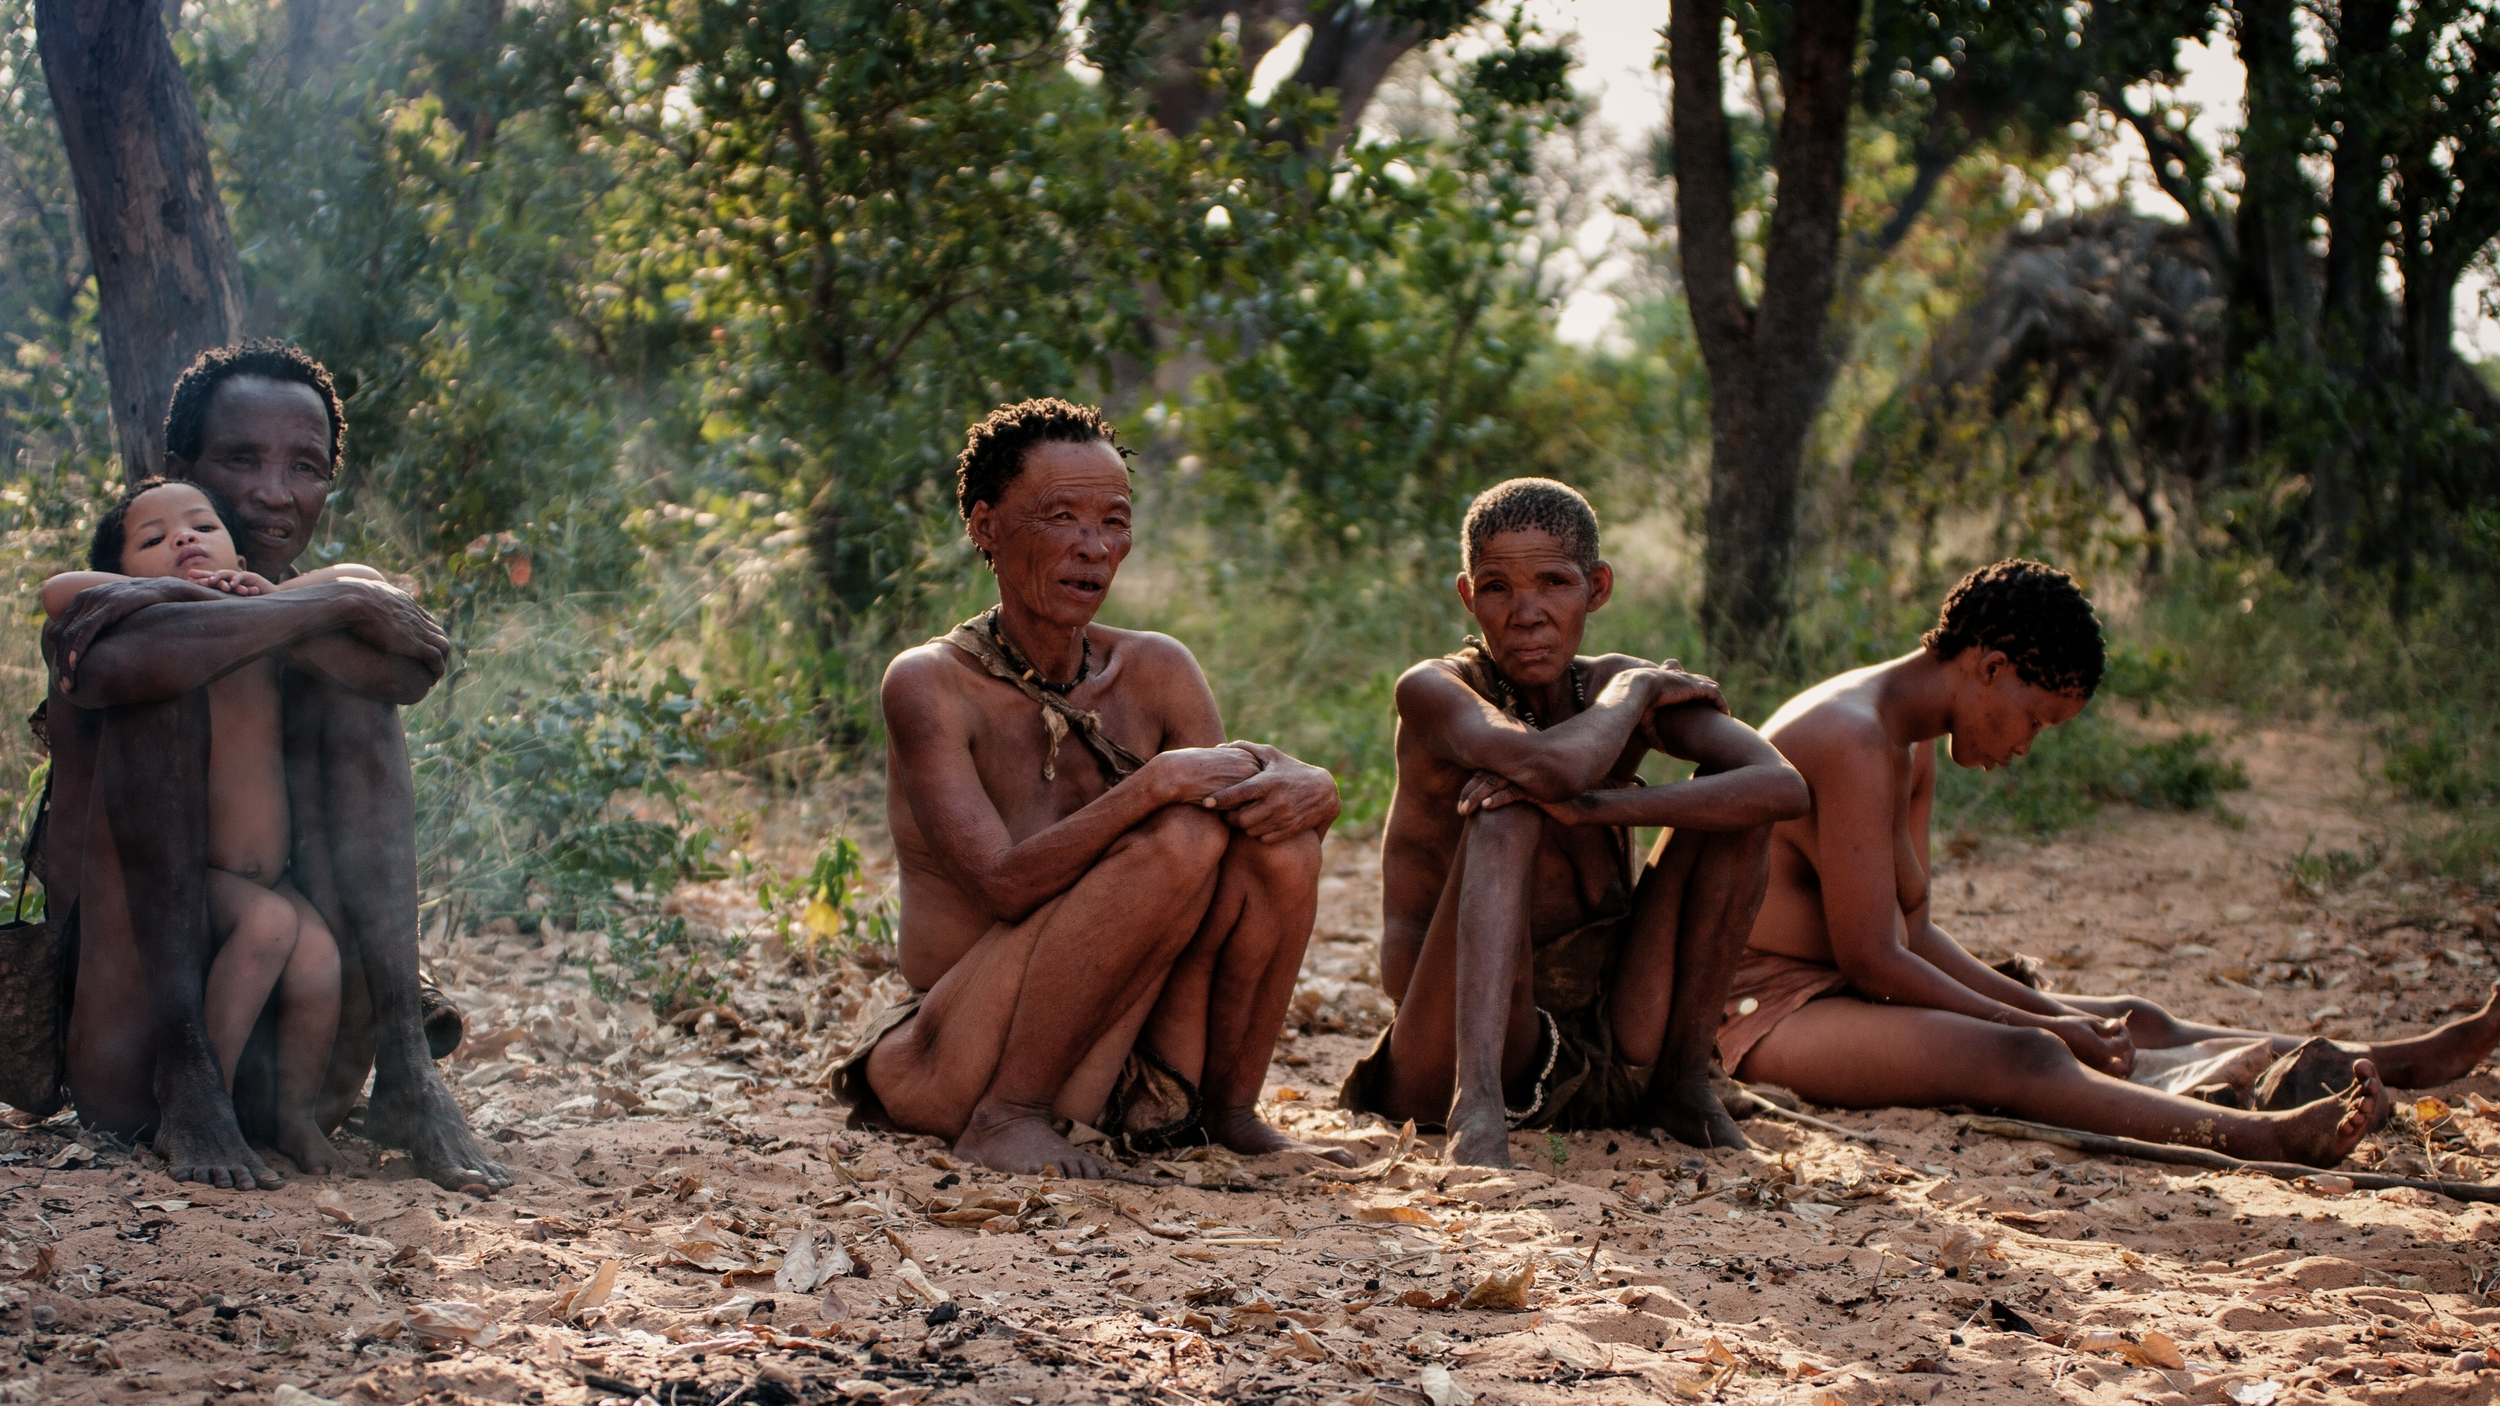 TSUMKWE, NAMIBIA